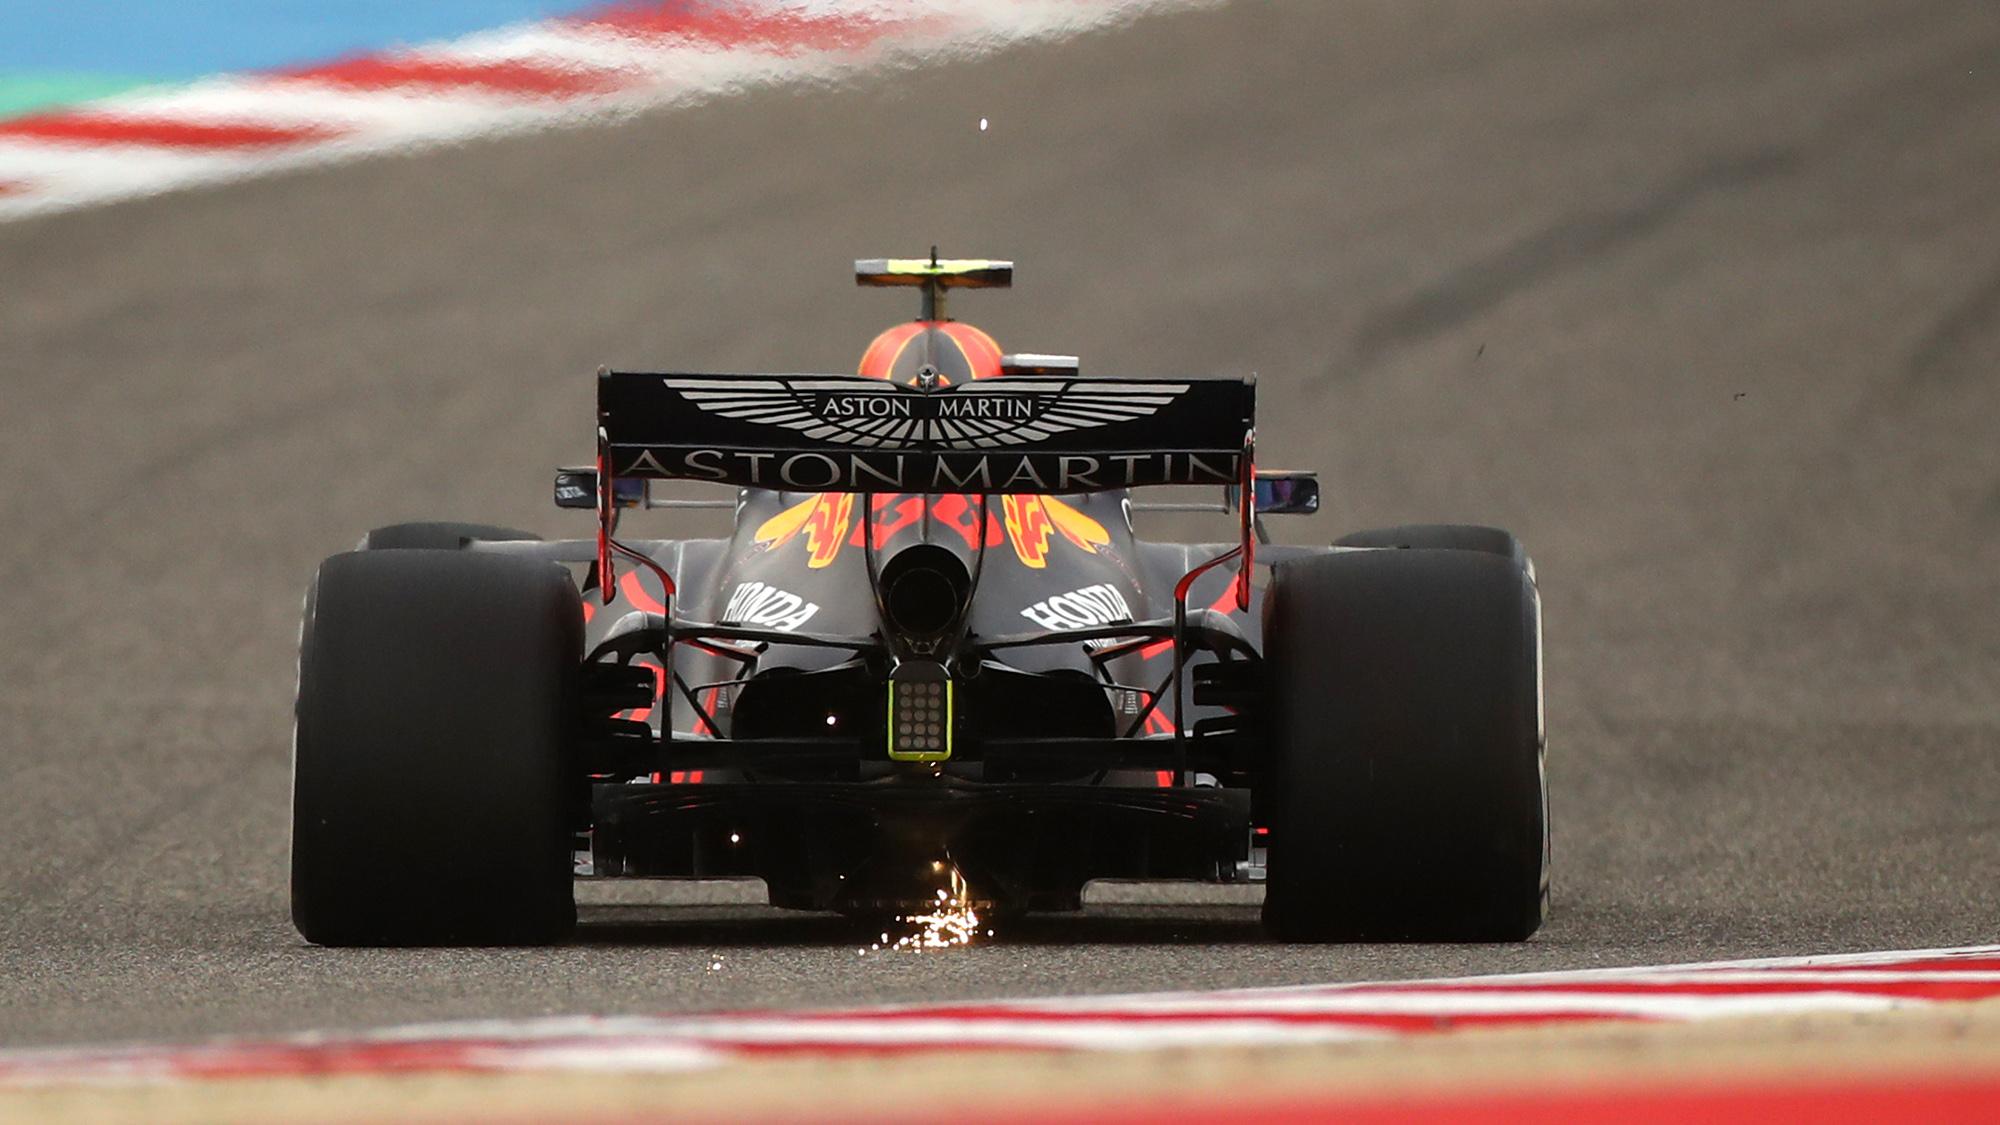 Red Bull rear view 2020 Sakhir Grand Prix